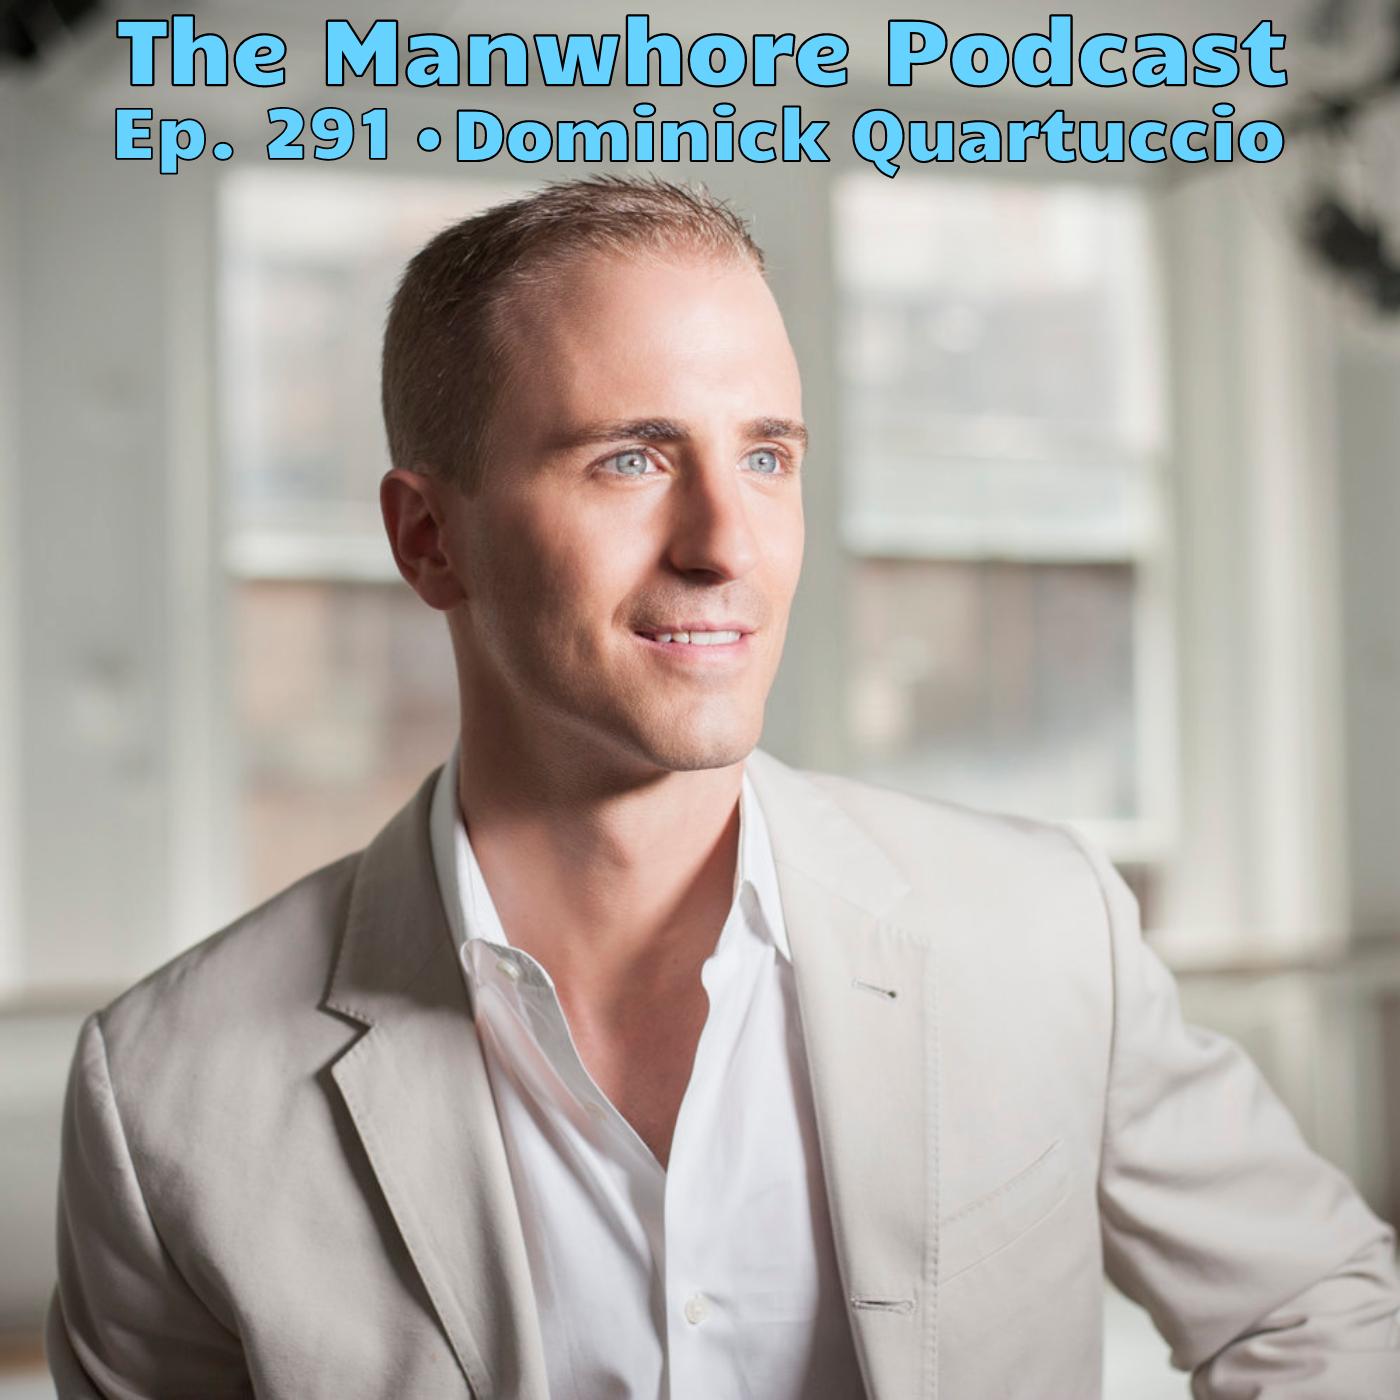 The Manwhore Podcast: A Sex-Positive Quest - Ep. 291: Leaving Sex Addicts Anonymous with Dominick Quartuccio // Are Sex Surrogates Legal? with Rachel Klechevsky